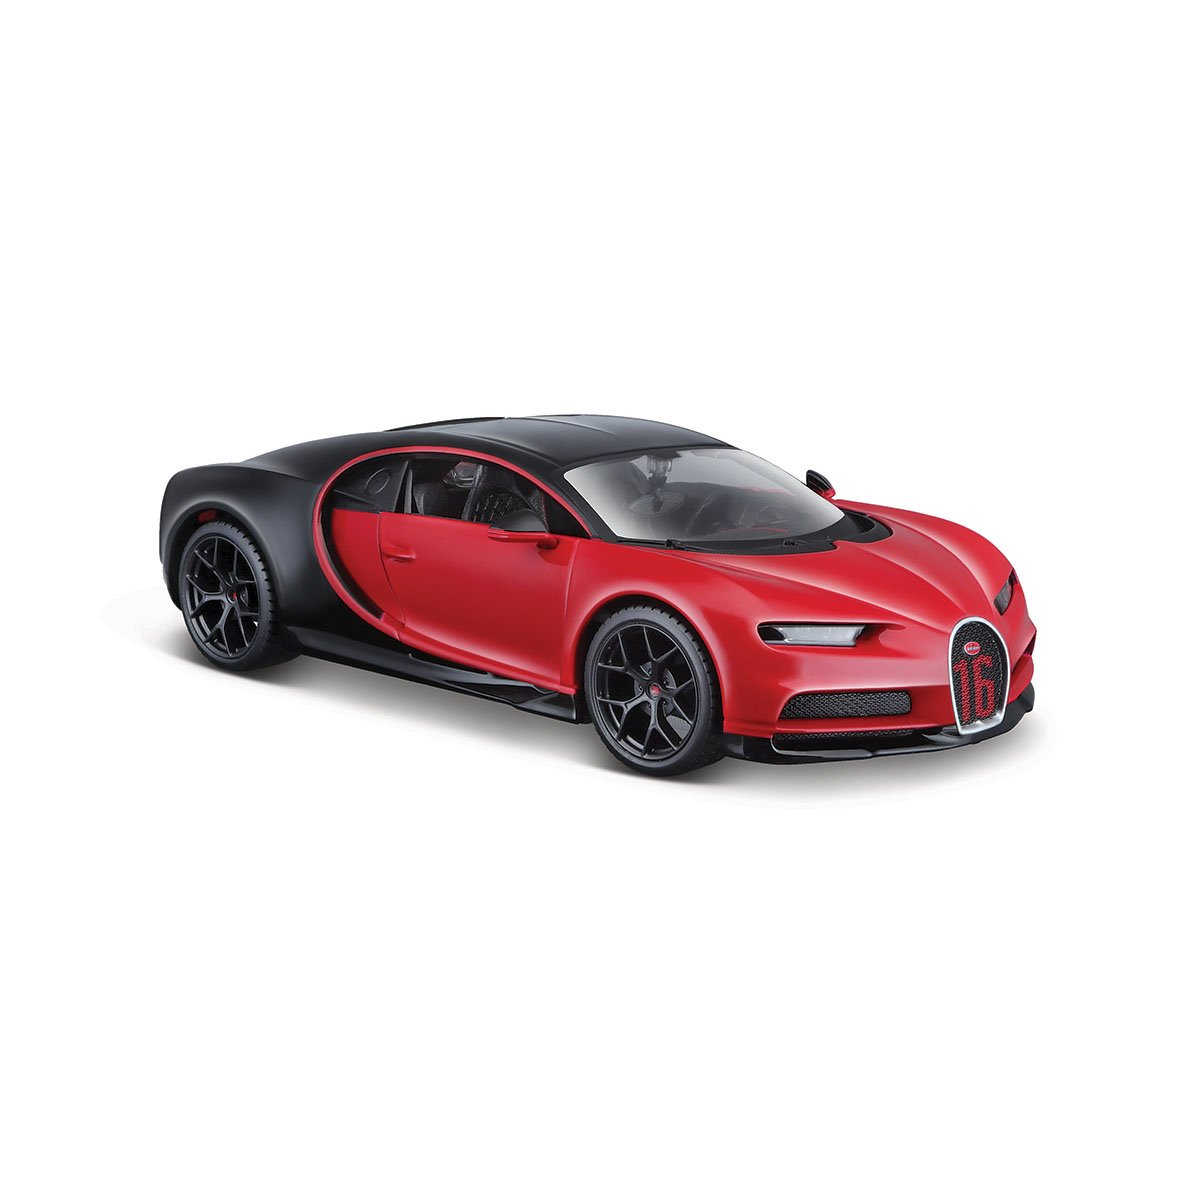 Masinuta Maisto Bugatti Chiron Sport. 1:24. Rosu